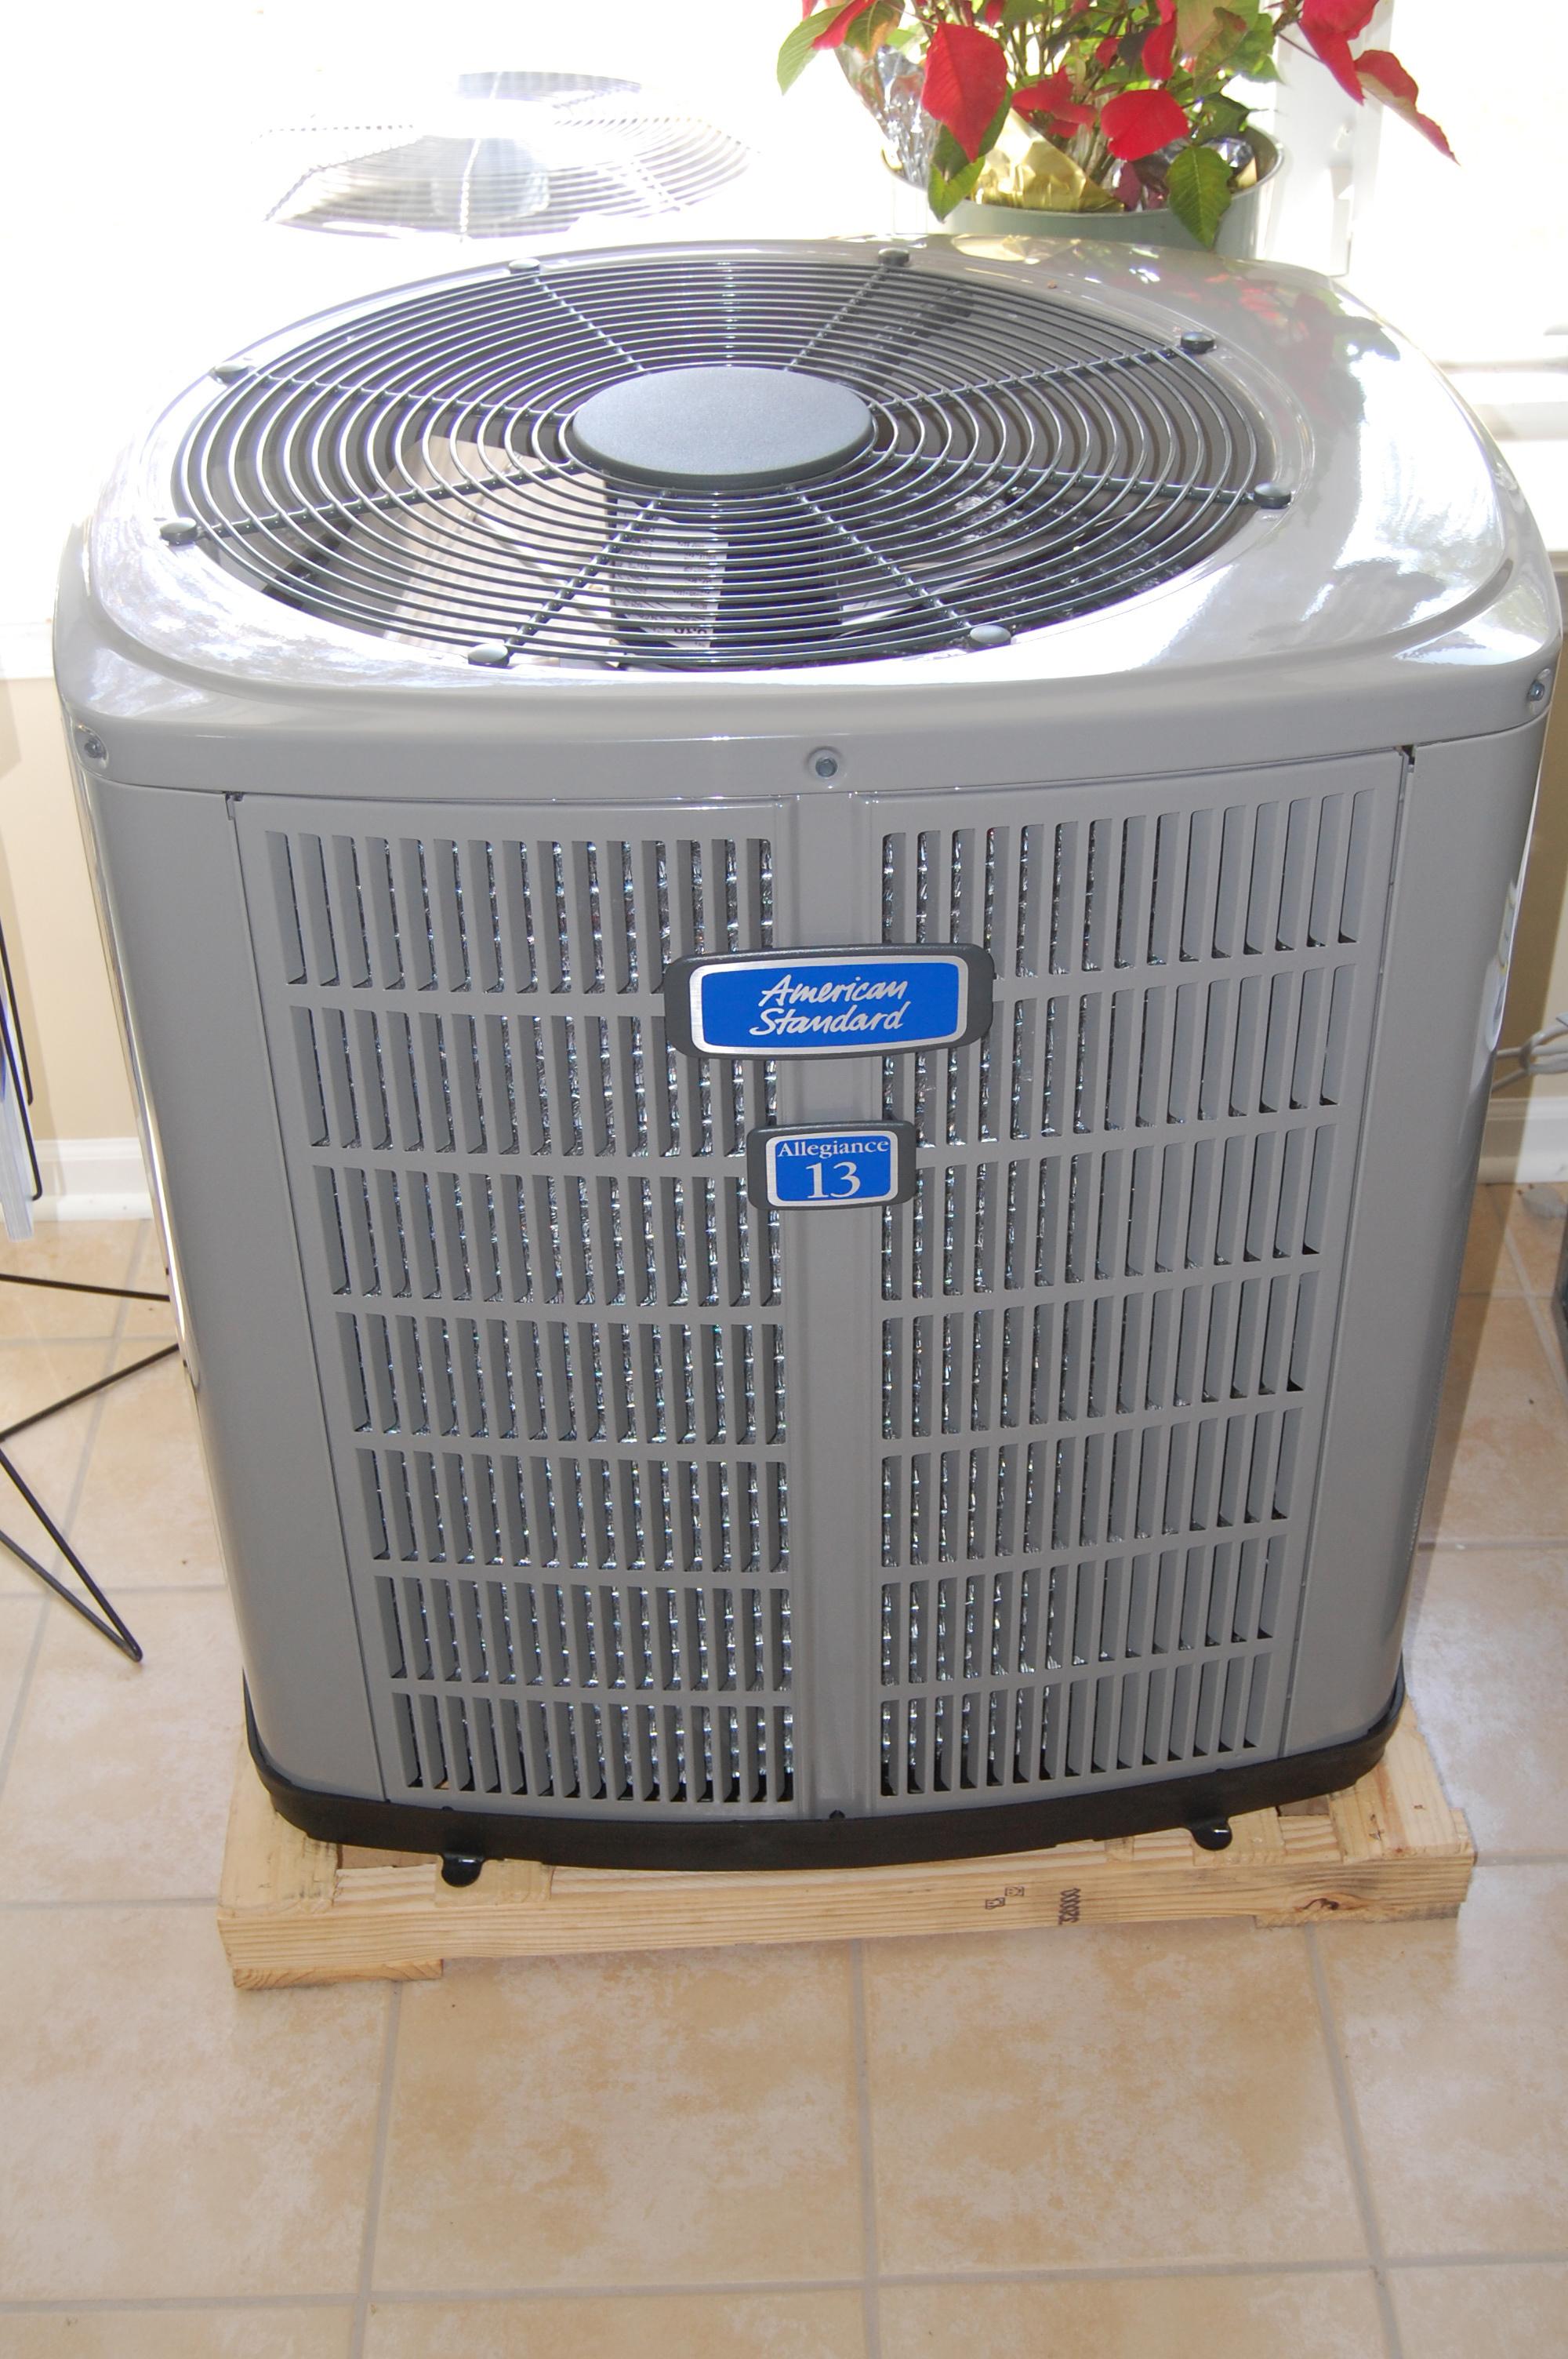 American Standard Air Conditioner Photos